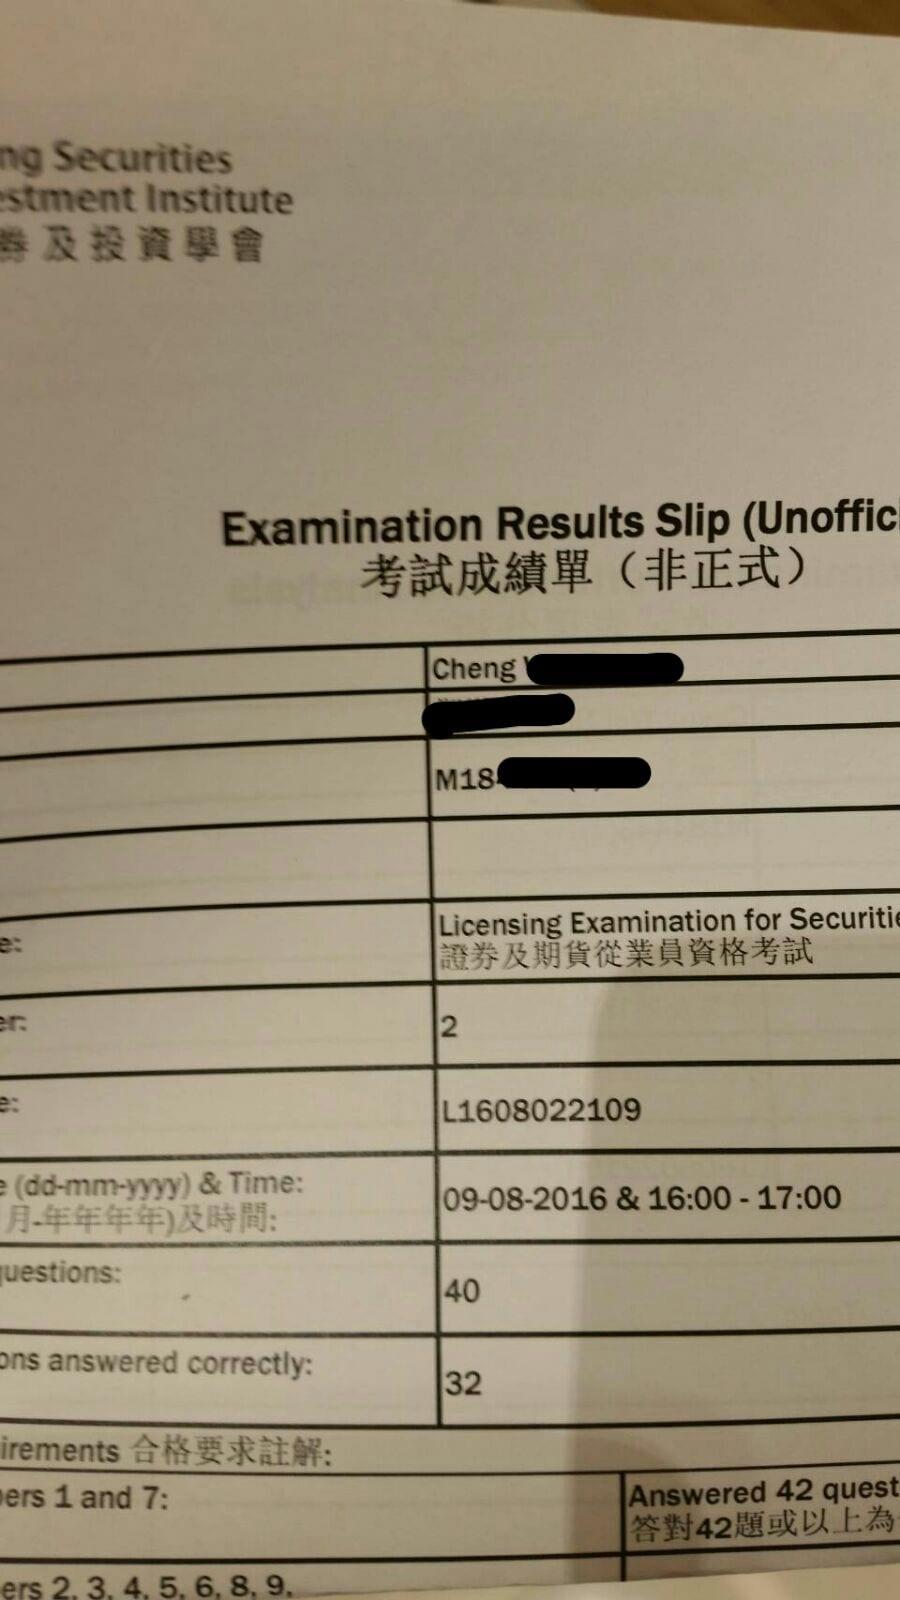 CWT 9/8/2016 LE Paper 2 證券期貨從業員資格考試卷二 Pass - 2C Exam